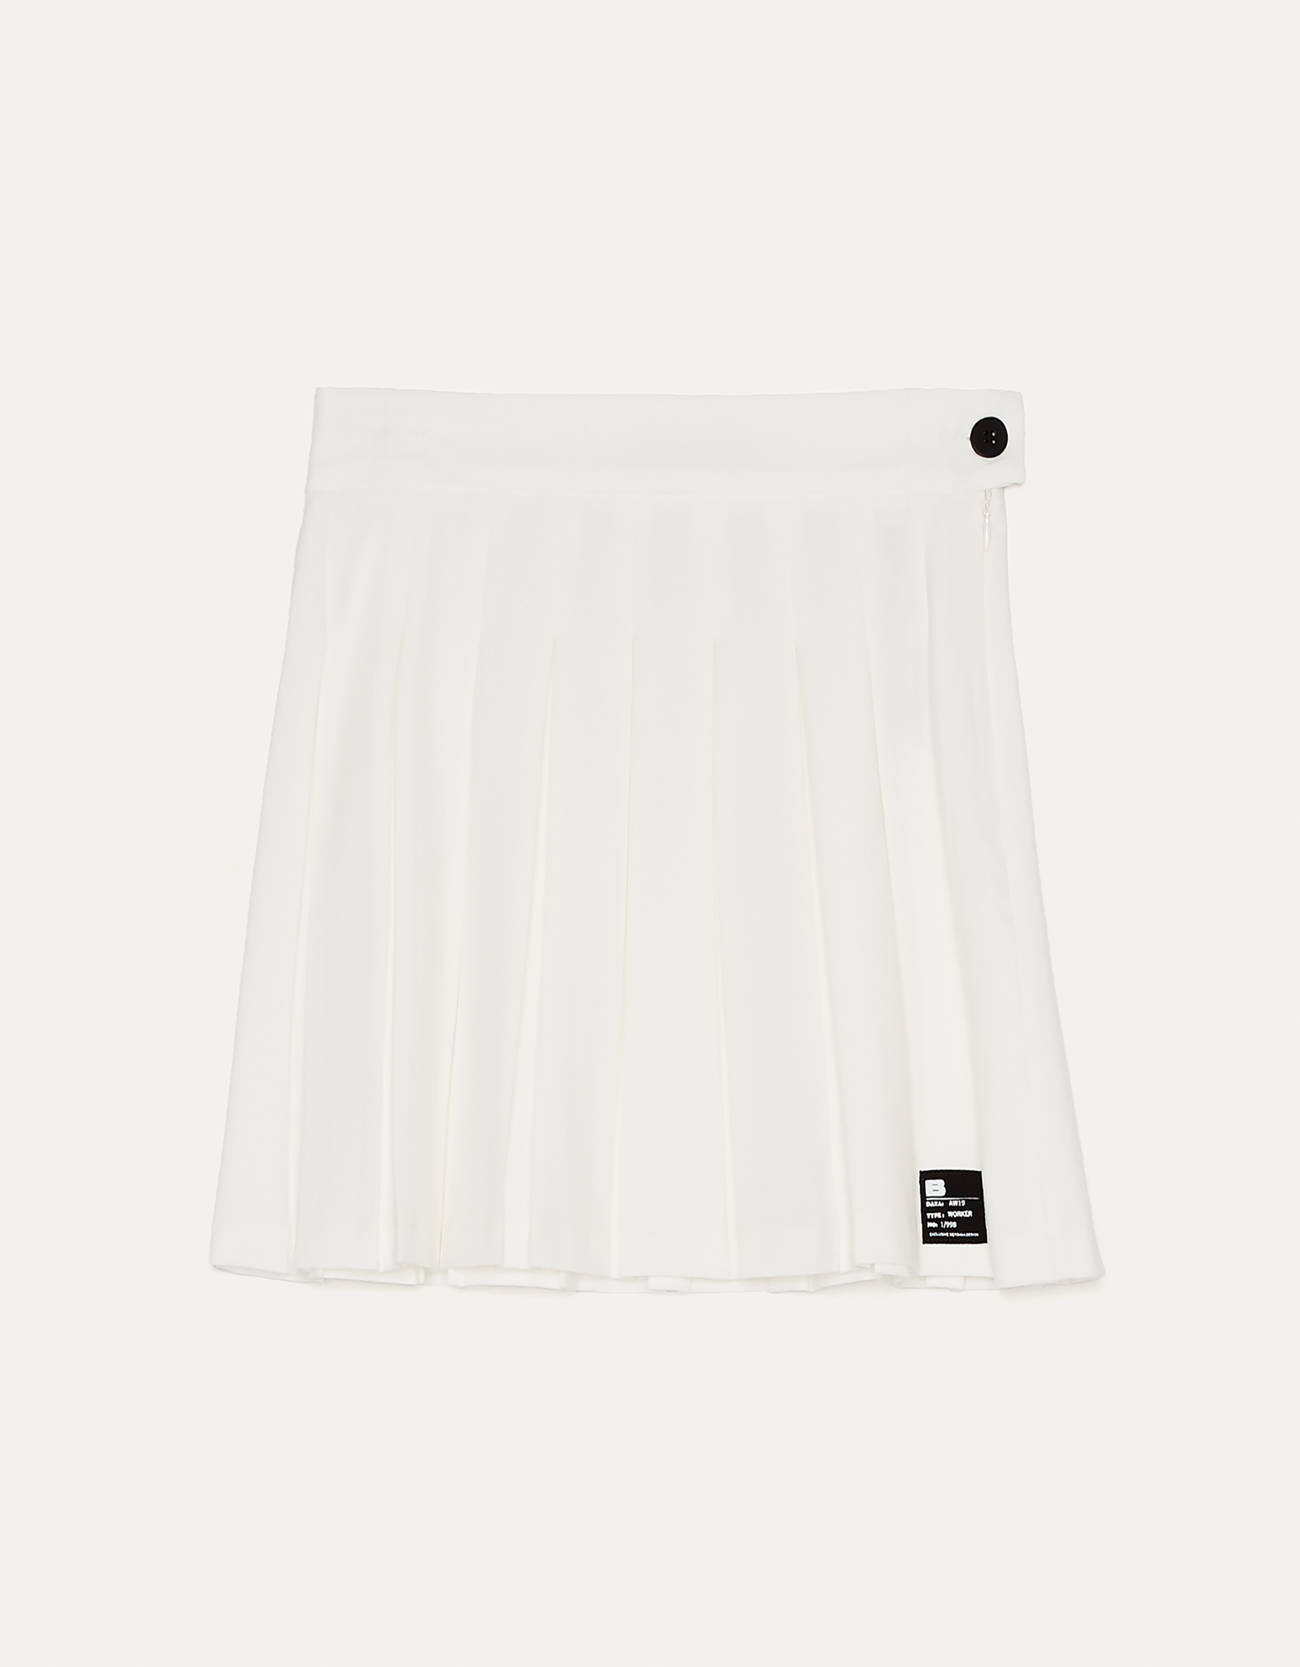 Falda mini plisada blanca con detalles negros.